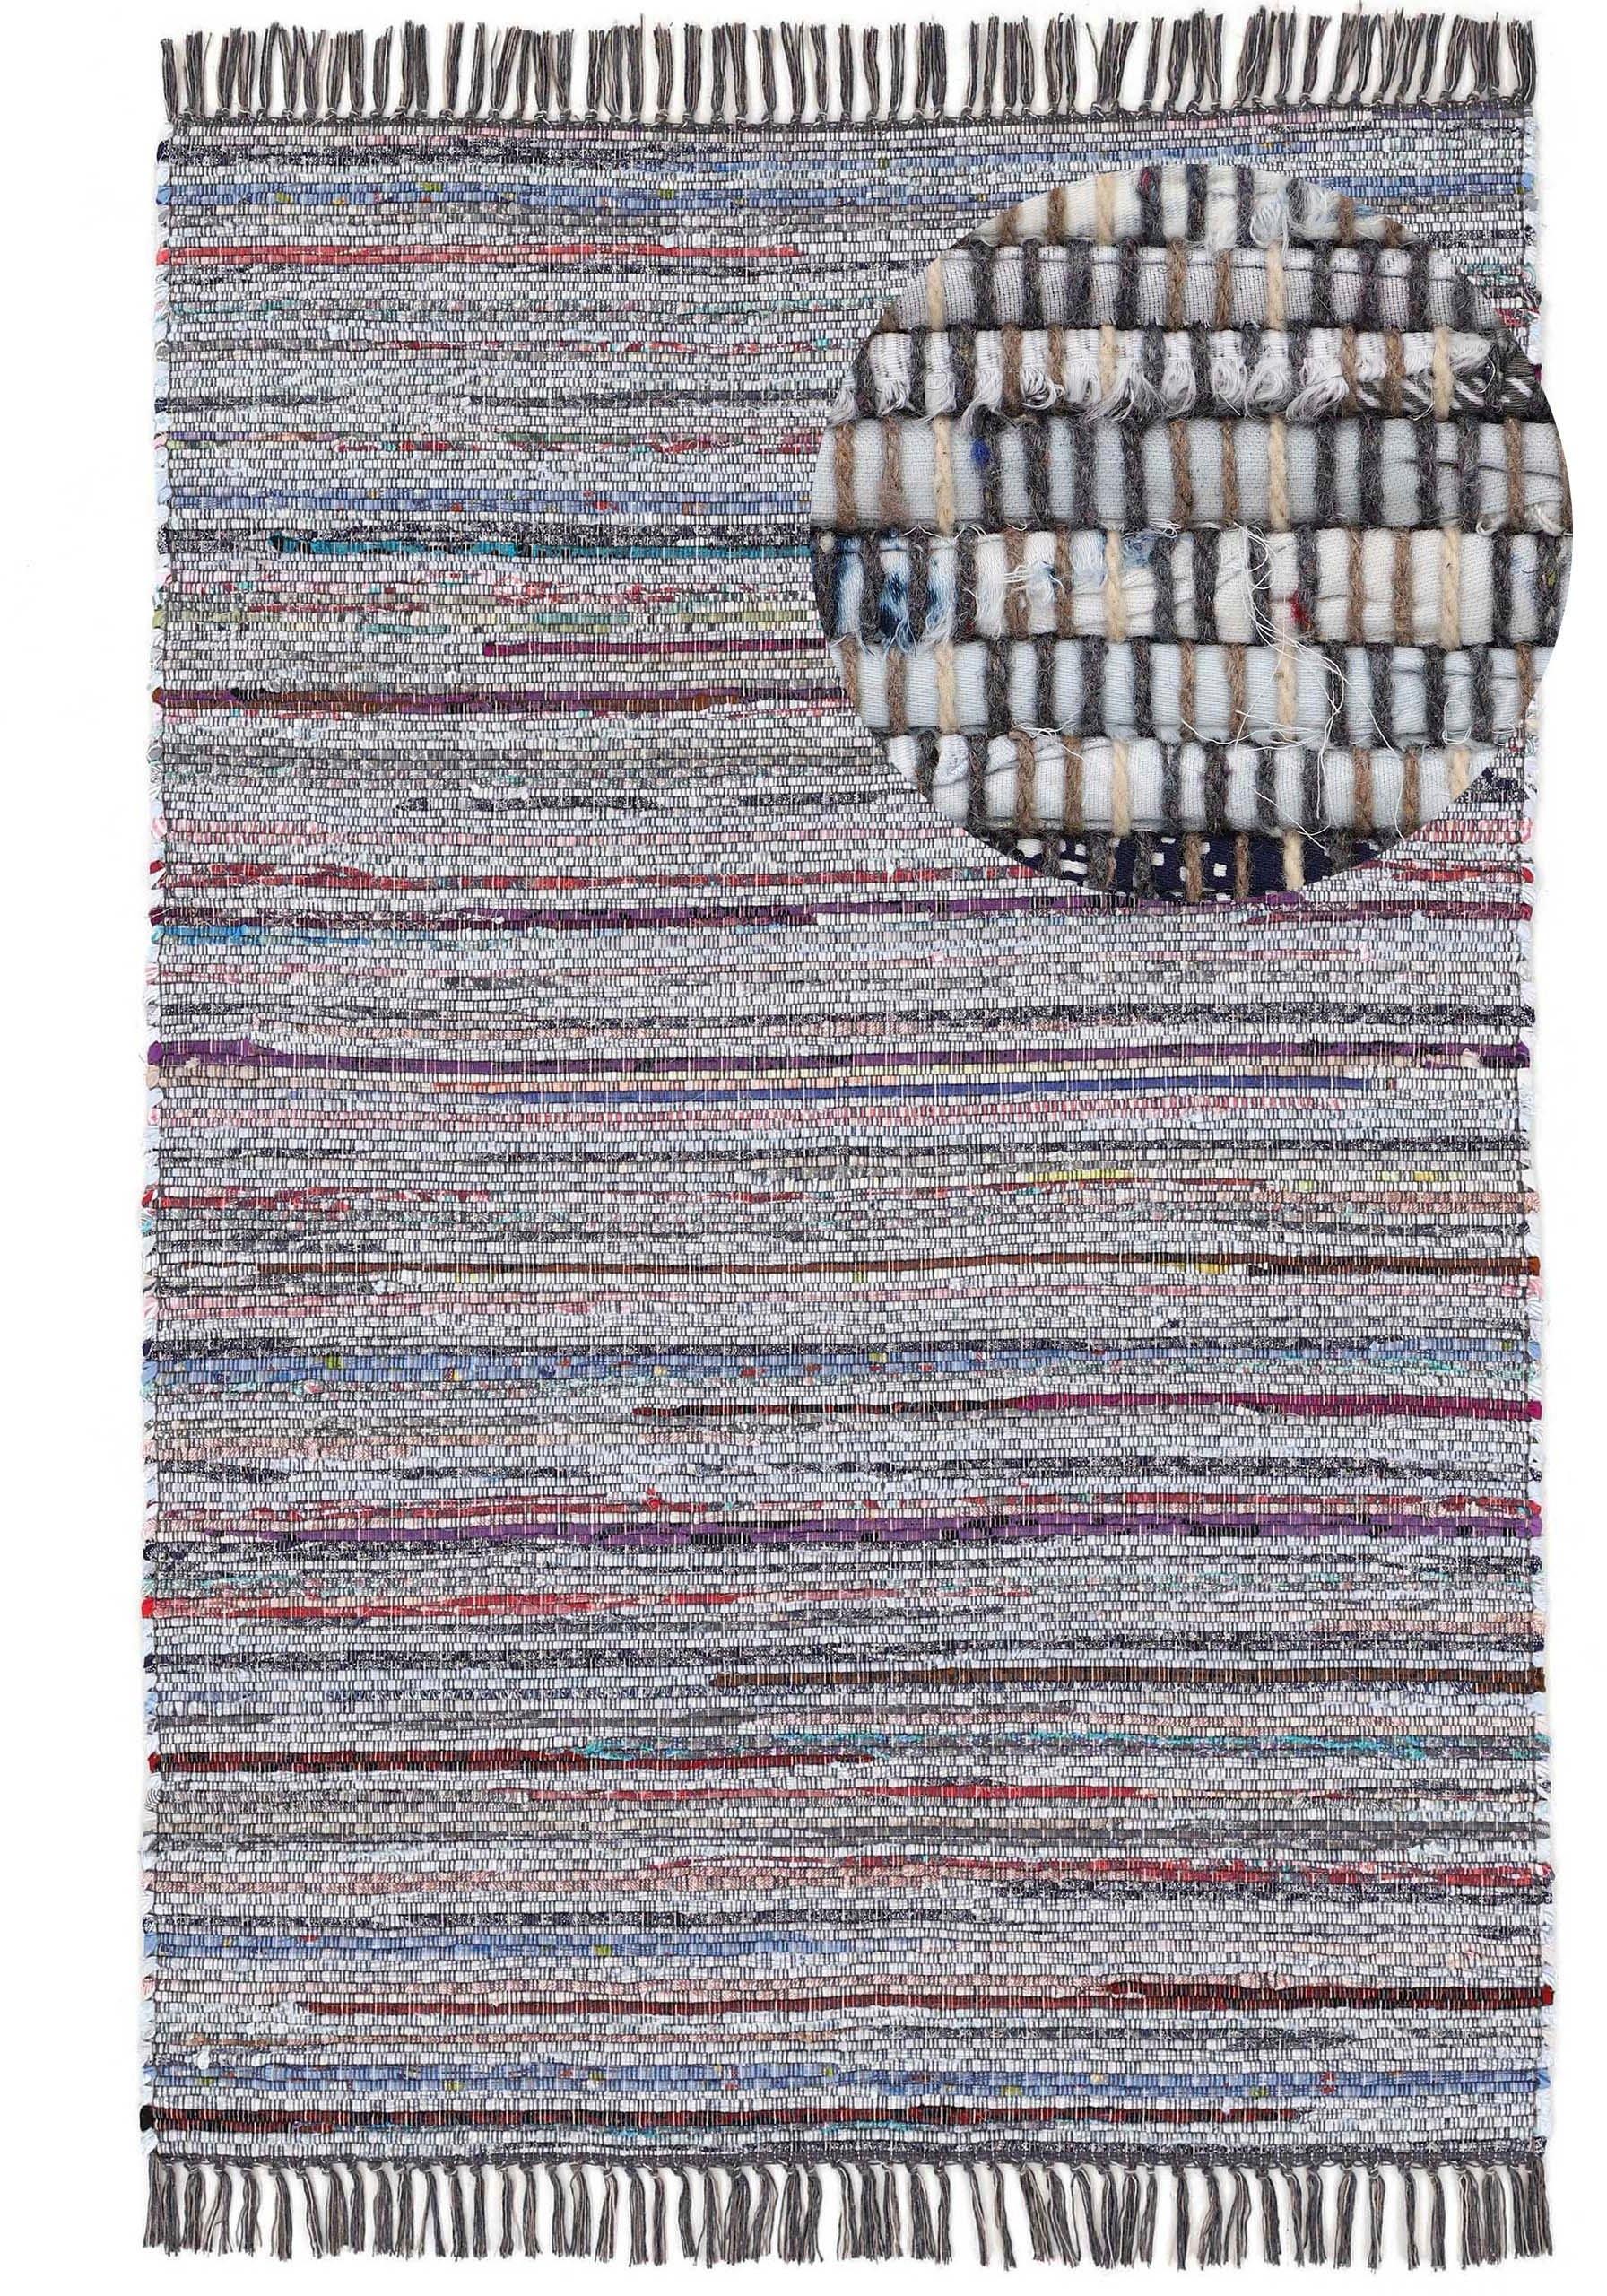 carpetfine vloerkleed Kelim Chindi Platweefsel tweezijdig te gebruiken kleed met franje, woonkamer nu online kopen bij OTTO